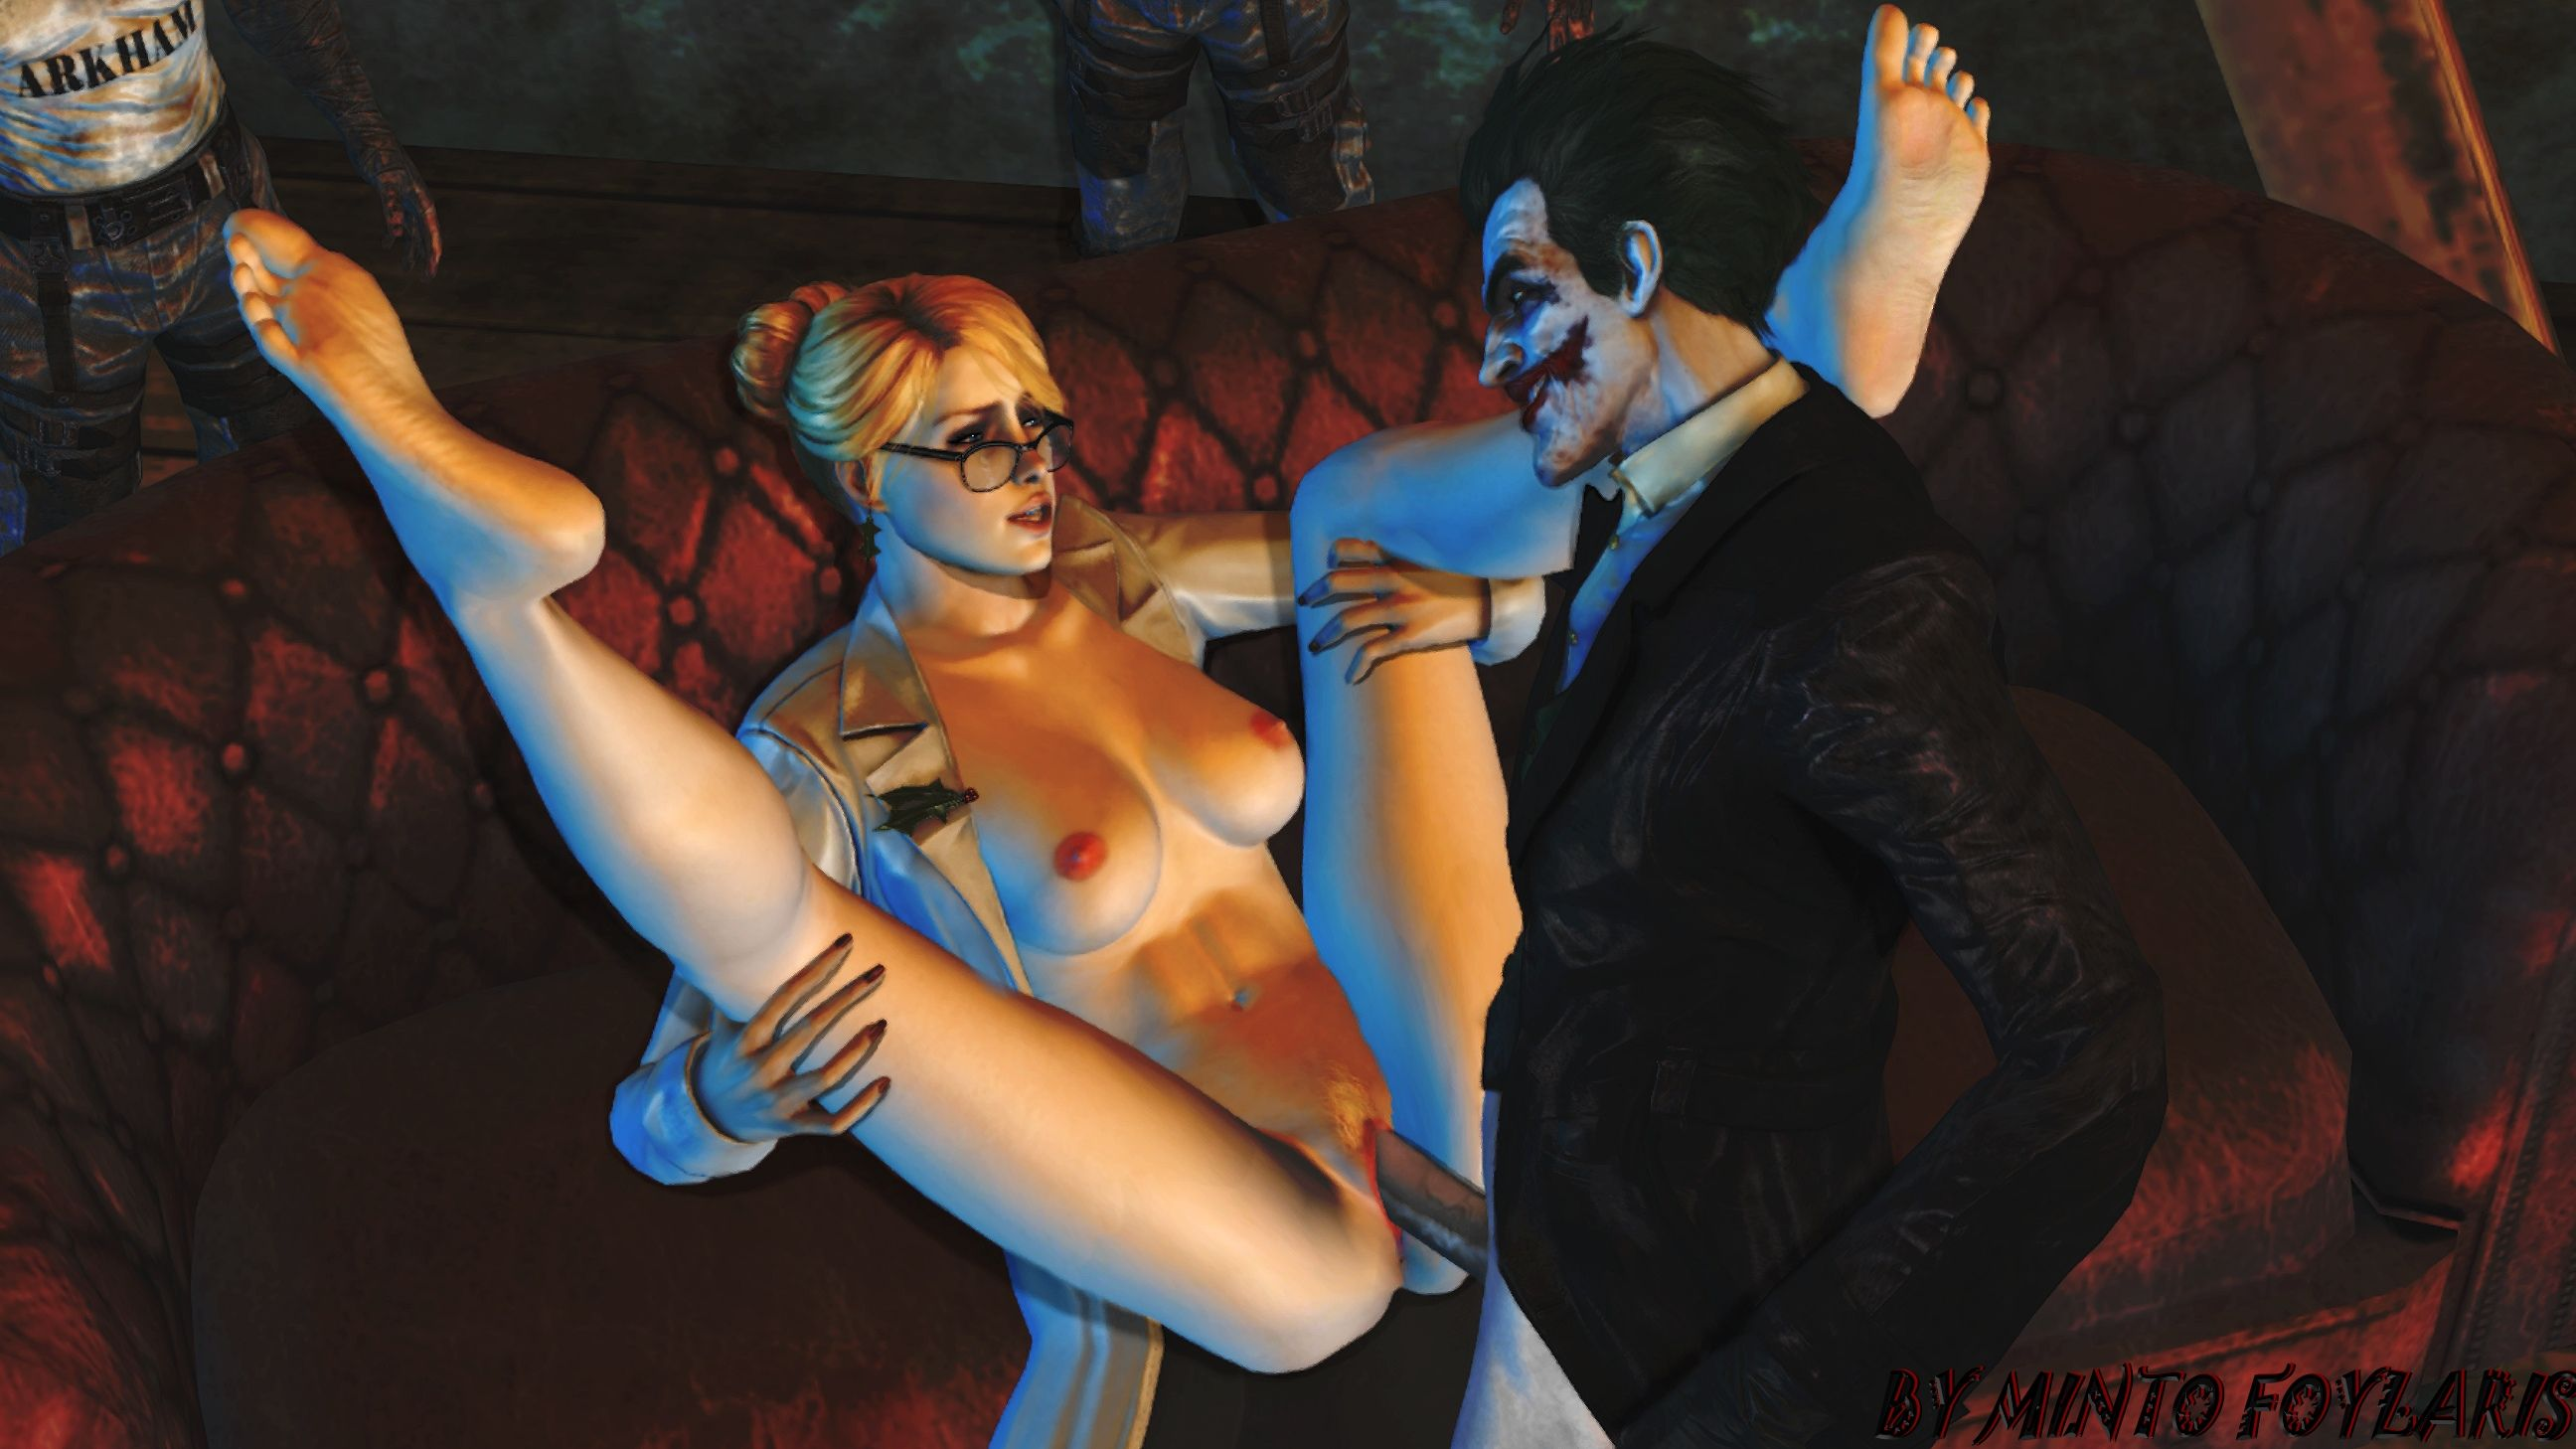 Batman Arkham Asylum Harley Quinn Nude